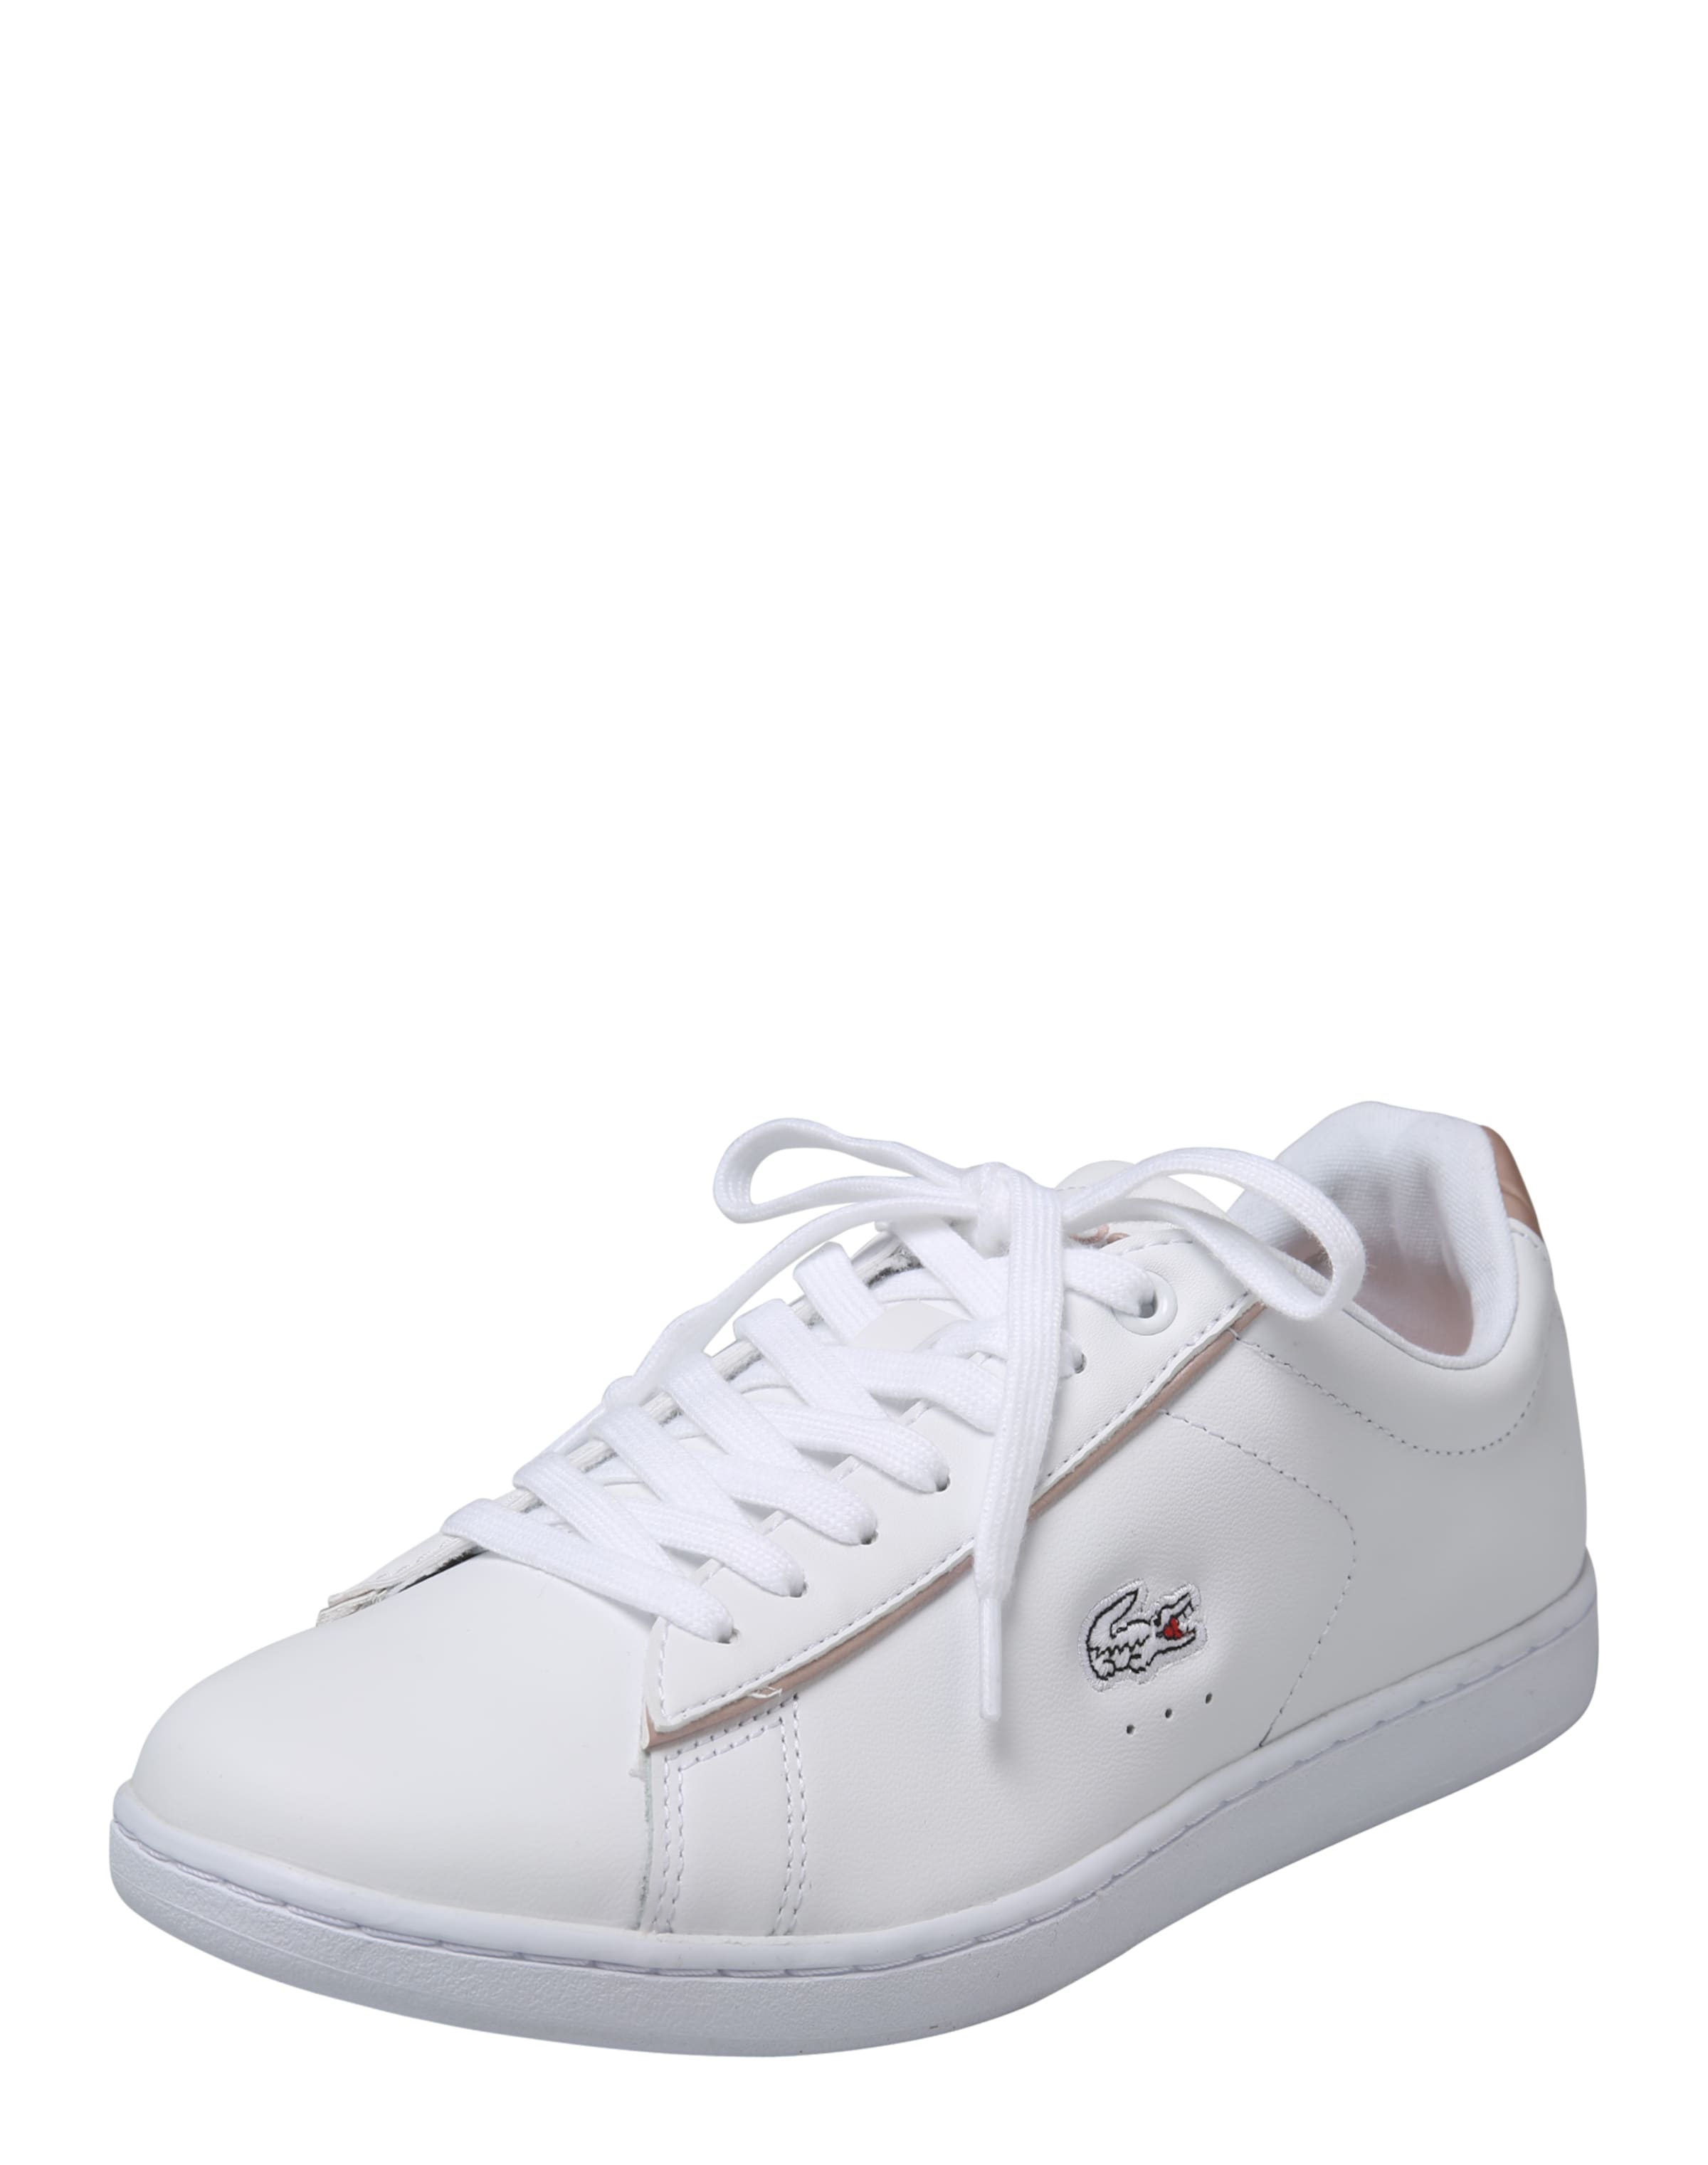 Haltbare Mode billige Schuhe LACOSTE | Sneaker 'Carnaby Evo' Schuhe Gut getragene Schuhe